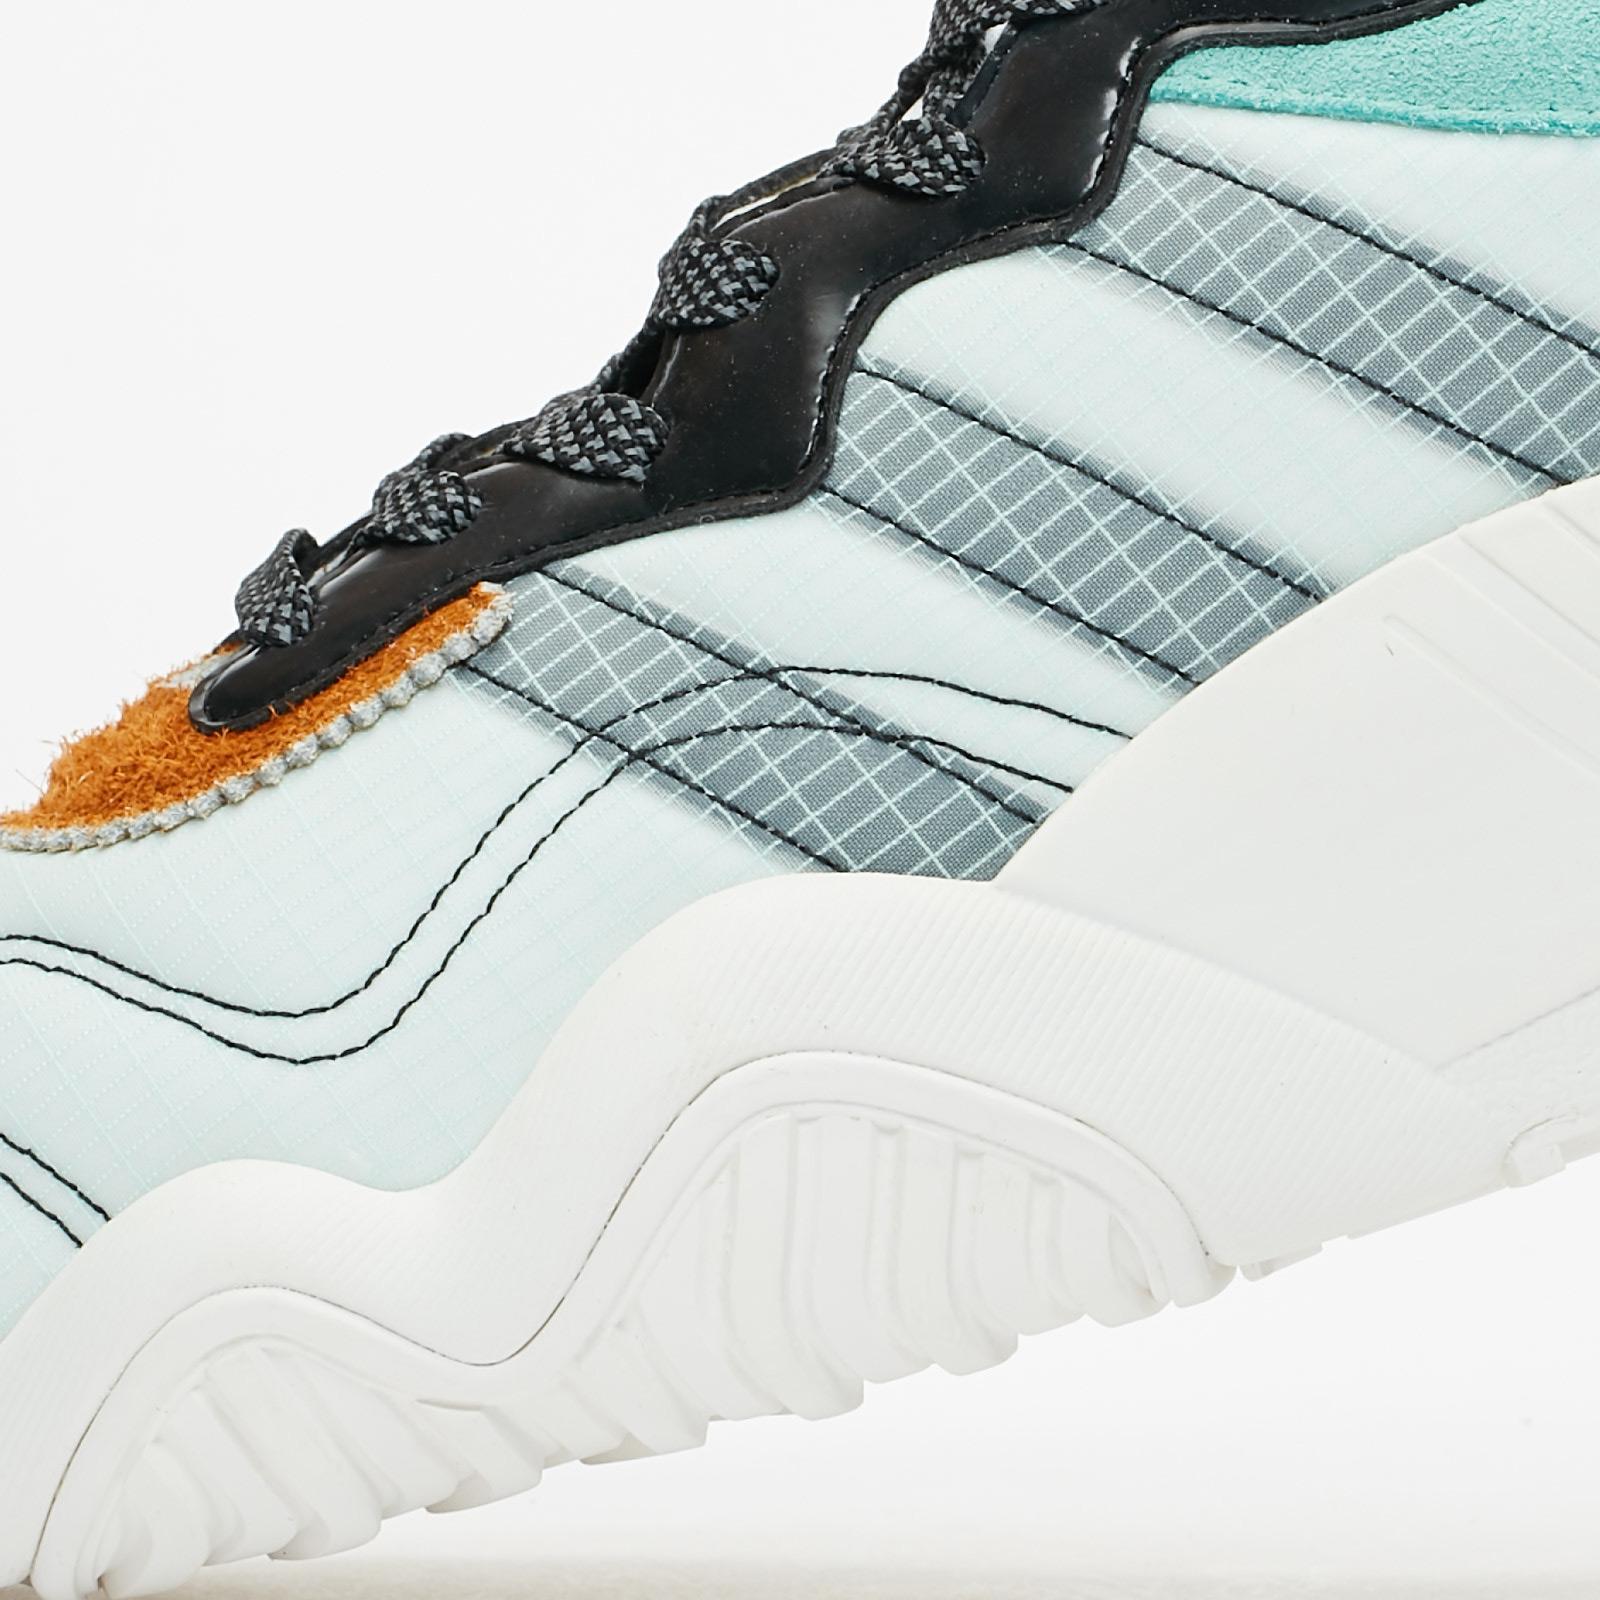 9d530da61b4 ... adidas Originals by Alexander Wang AW Turnout Trainer